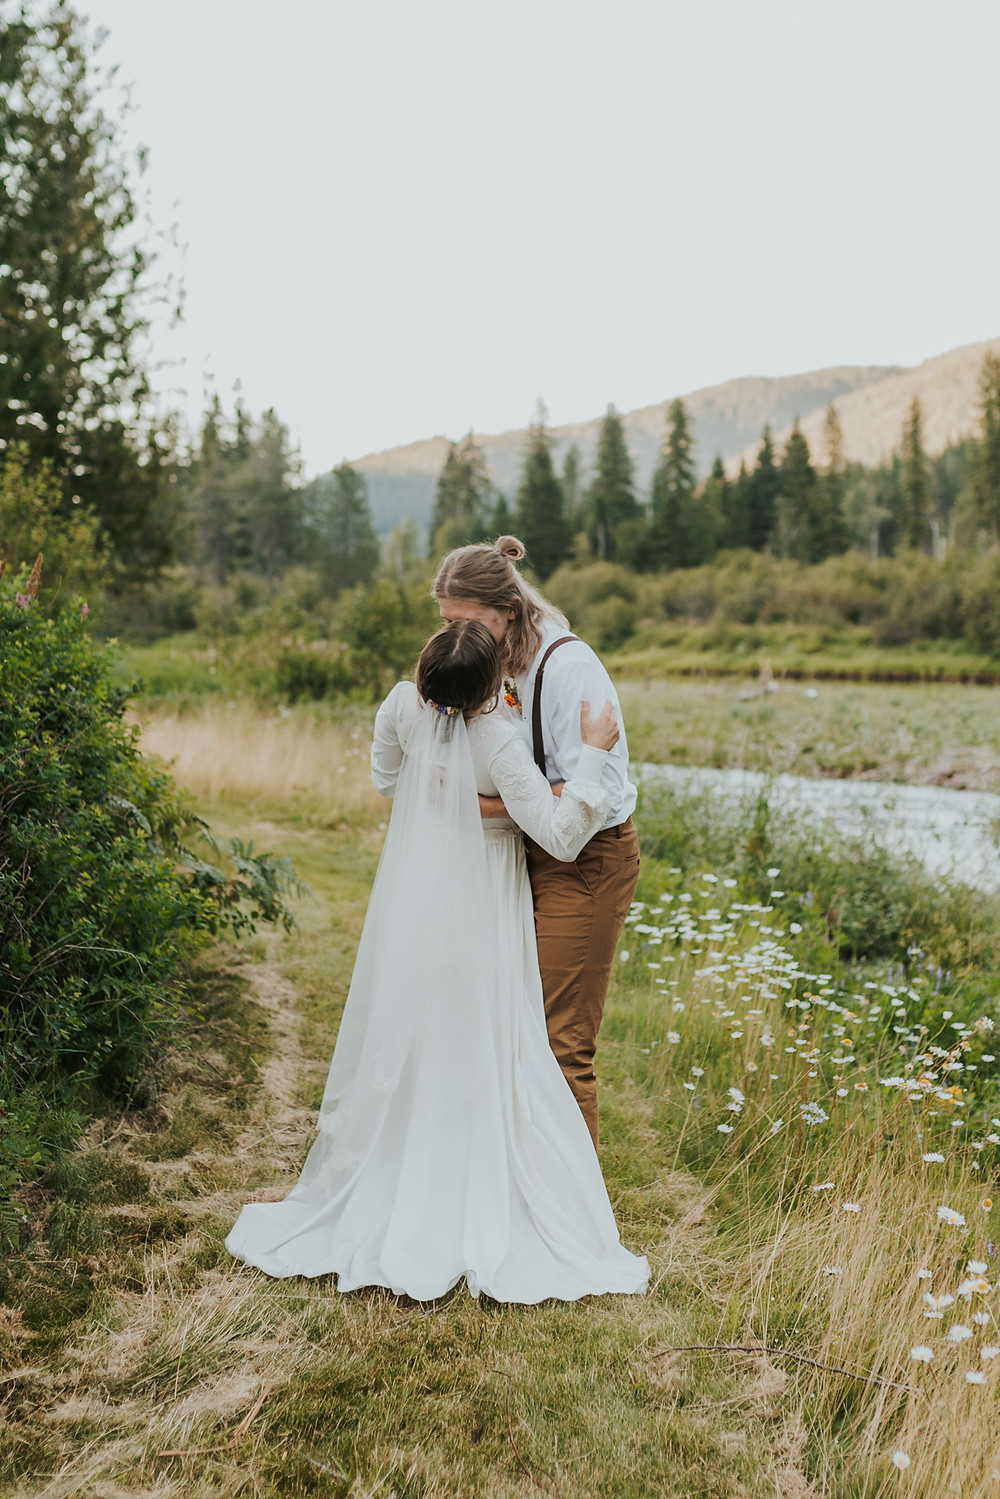 Bride and Groom Adventure Portraits